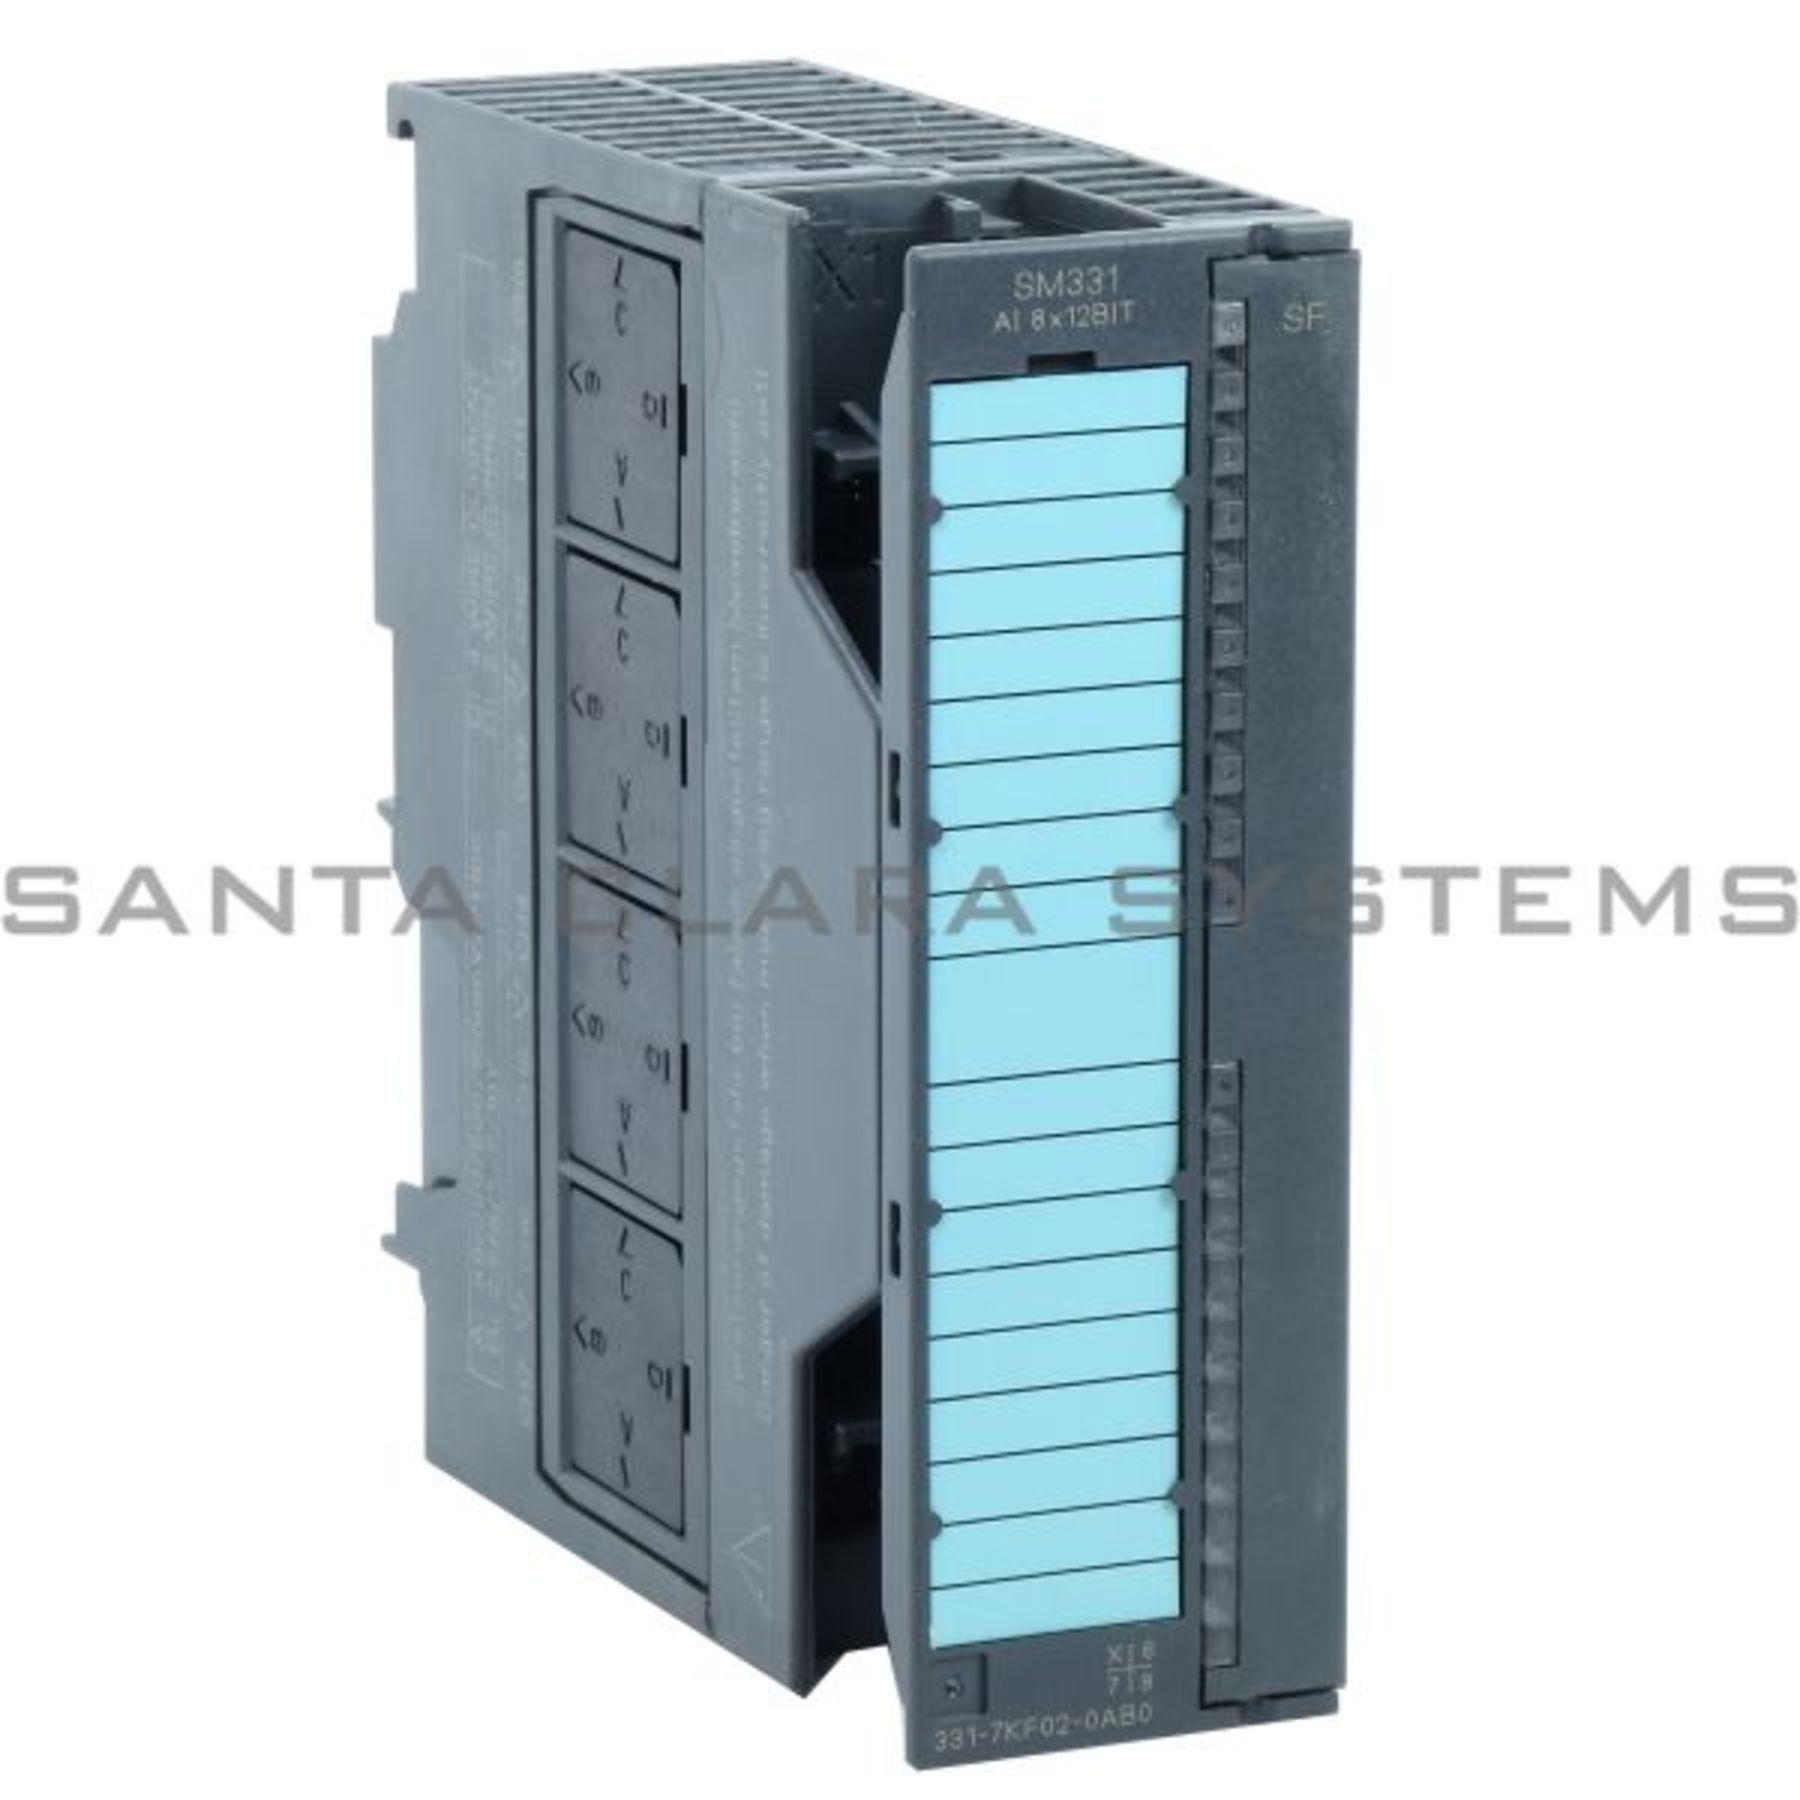 used SIEMENS Simatic S7 Analog Input SM331 AI8 6ES7 331-1KF02-0AB0 Garantie